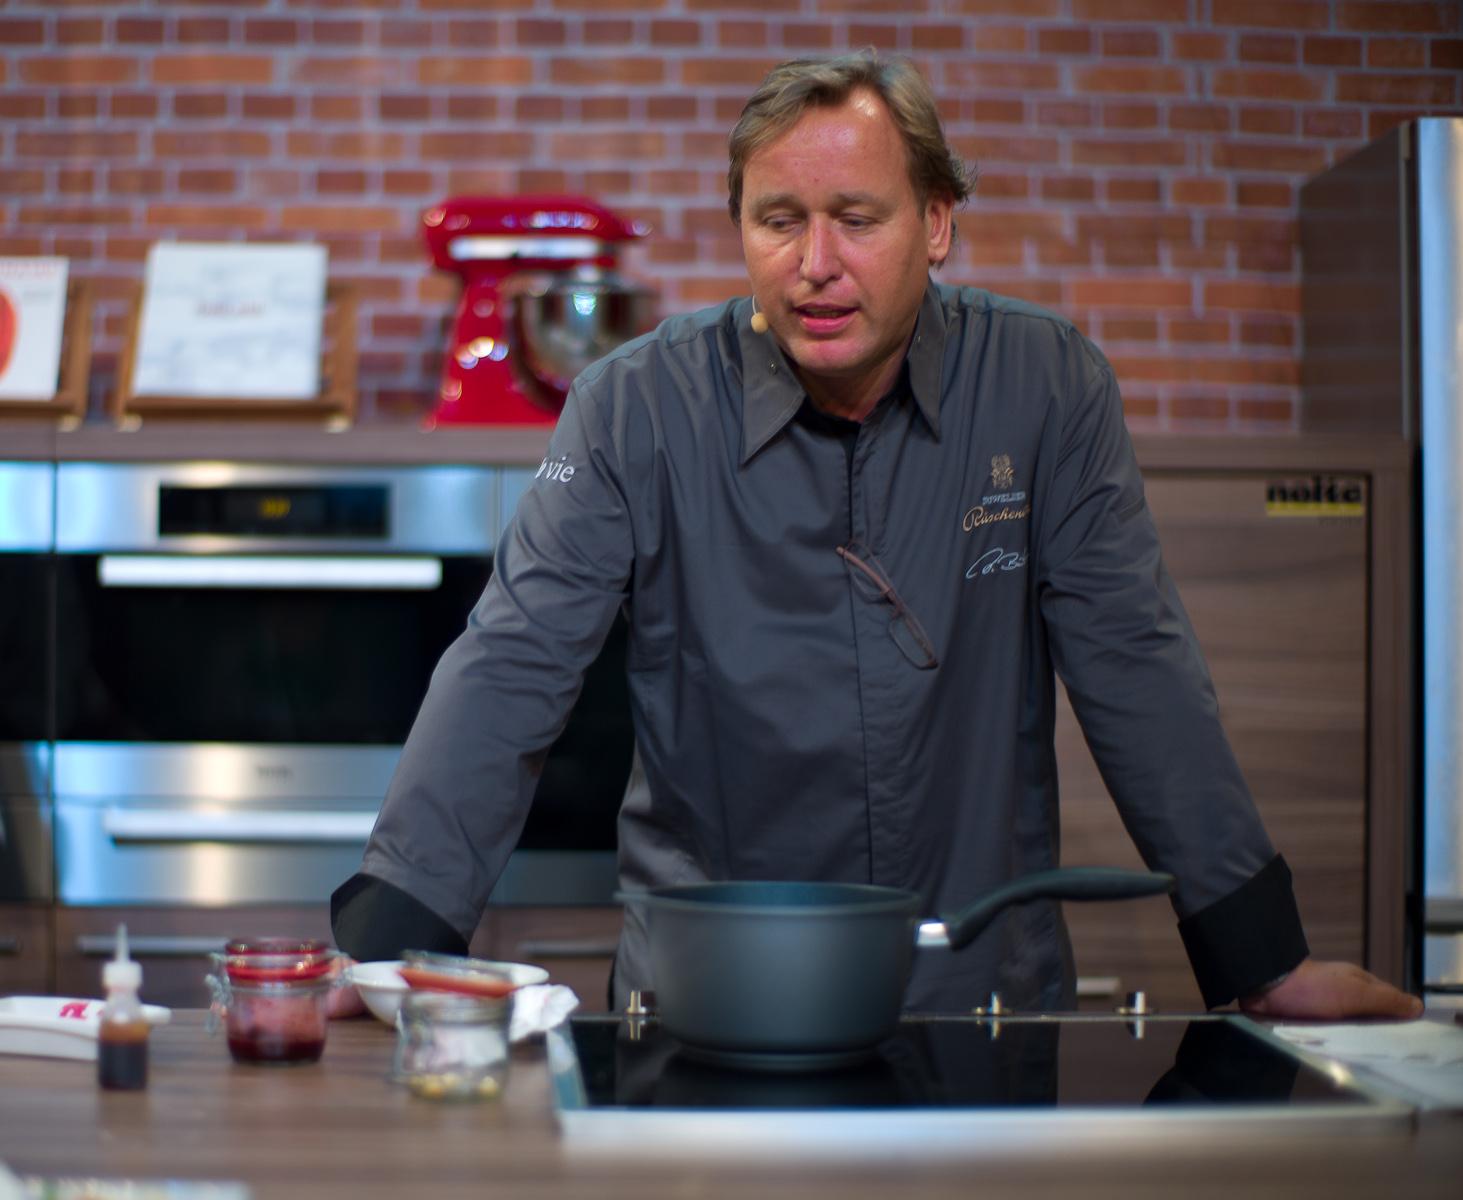 Chef Thomas Bühner of La Vie, giving his presentation